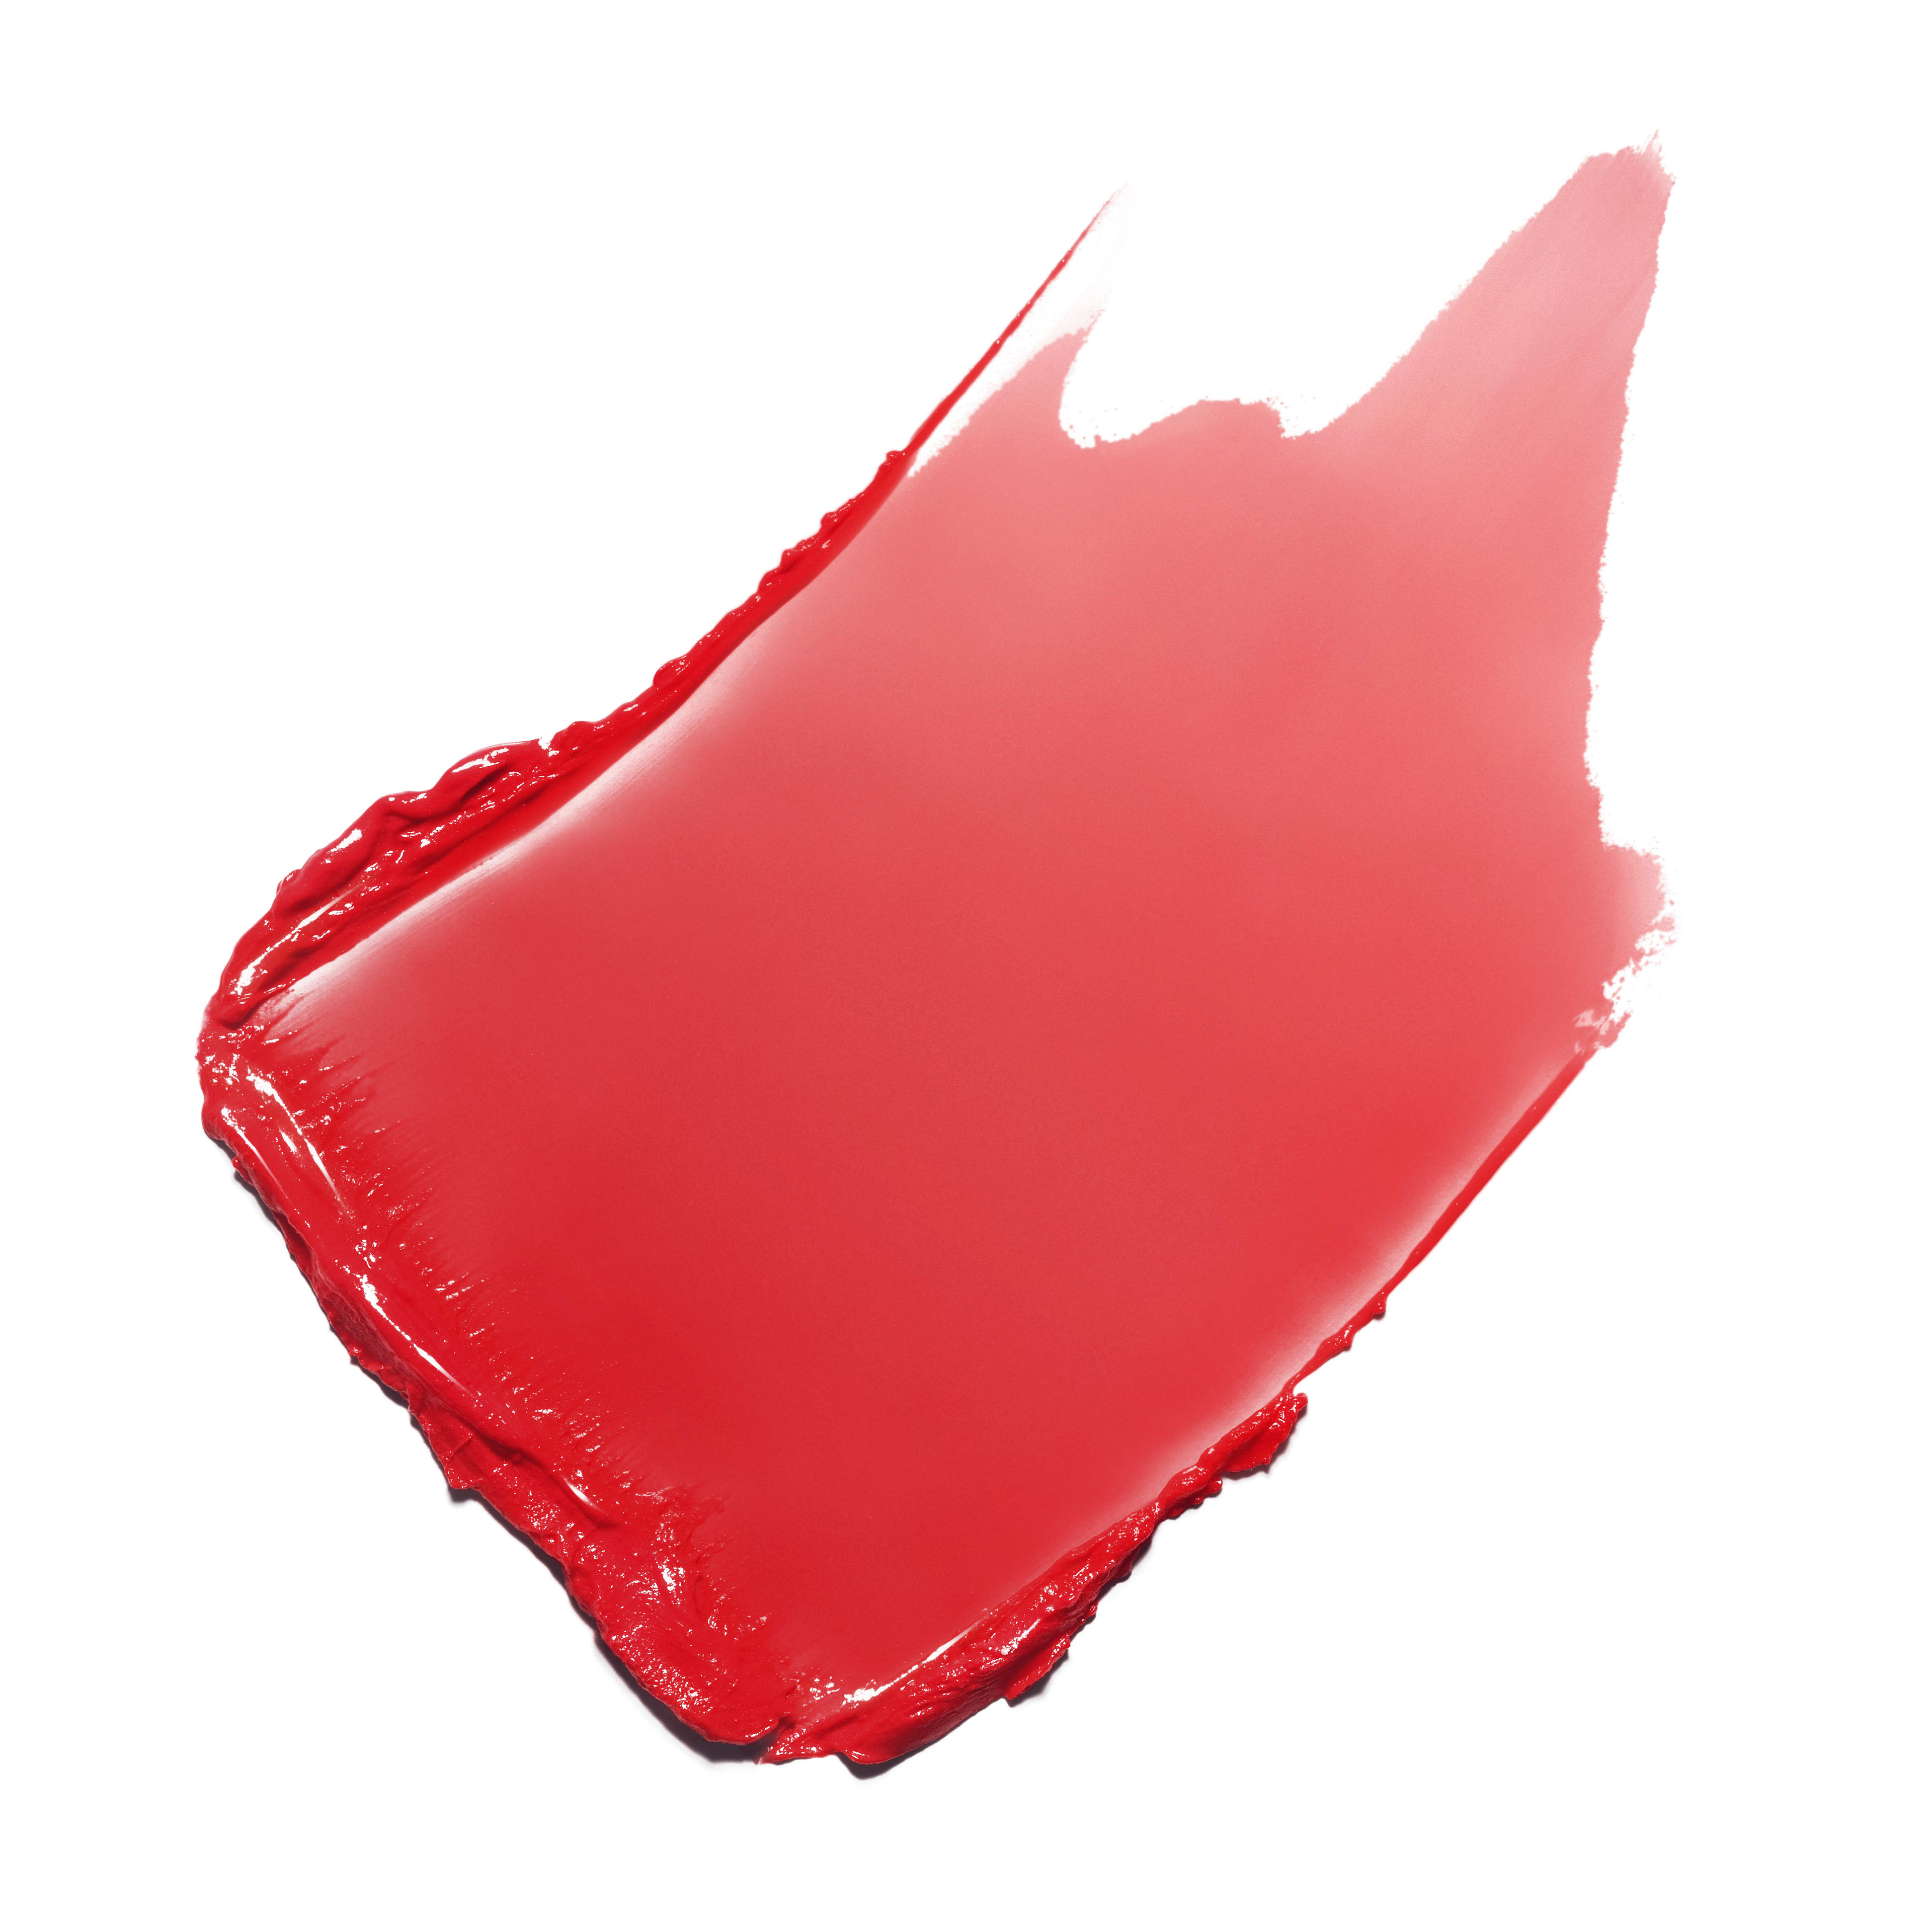 ROUGE COCO FLASH - makeup - 0.1OZ. - Basic texture view